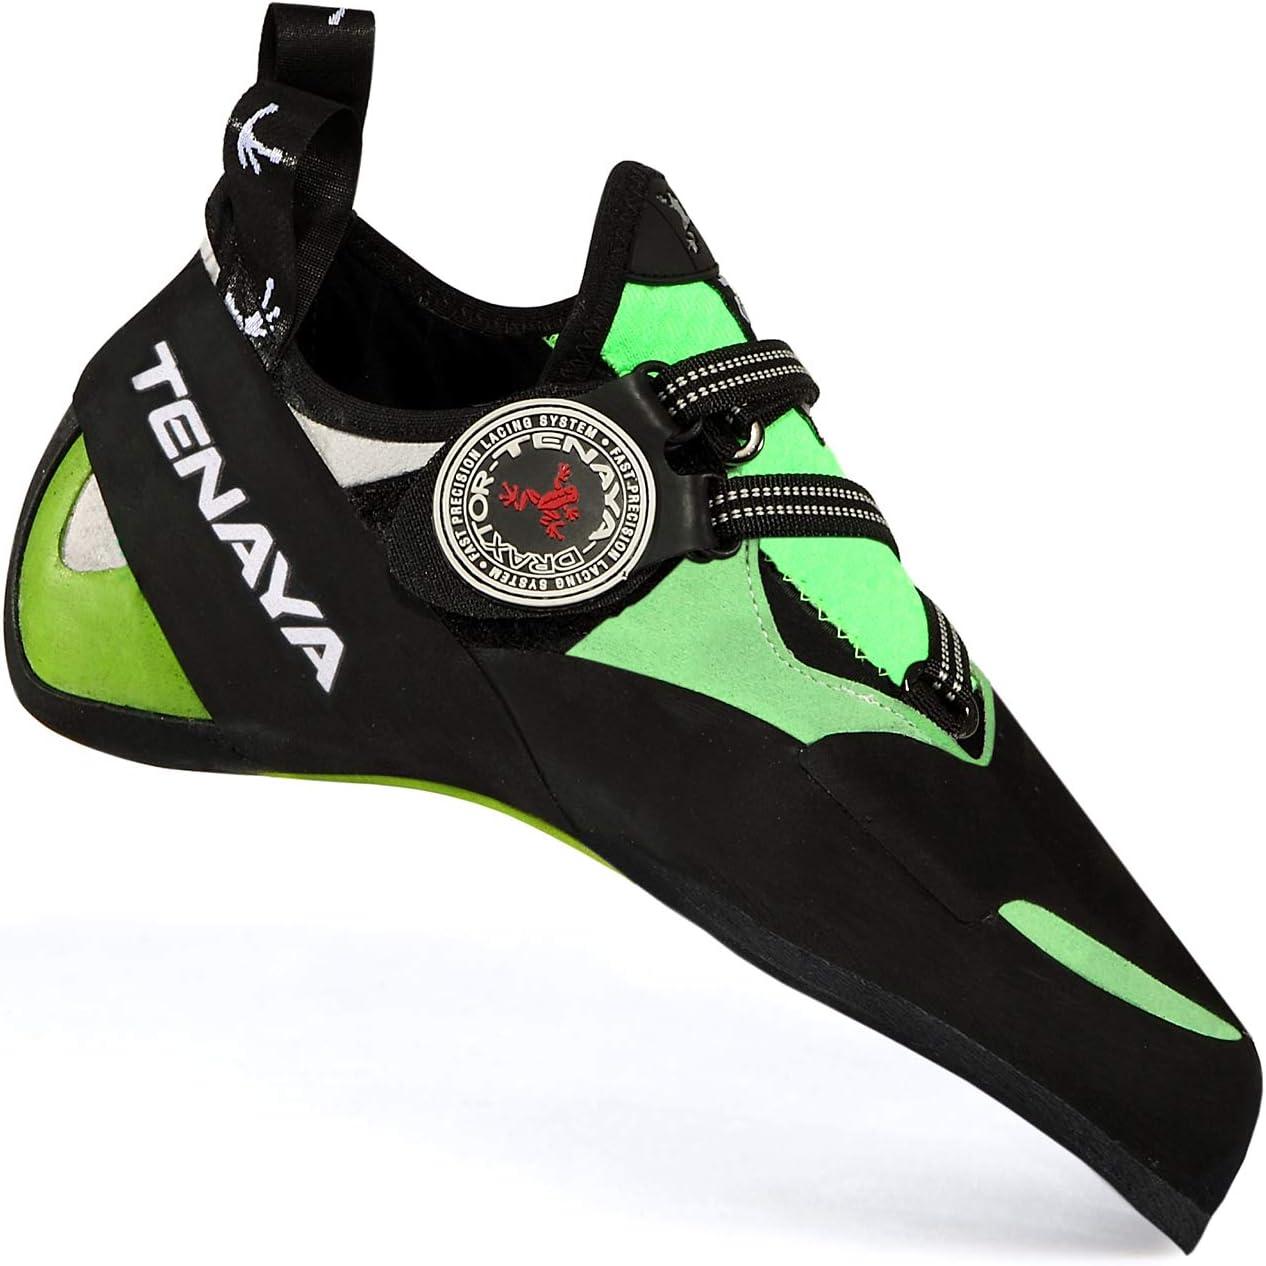 Tenaya Mundaka Rock Climbing Shoes